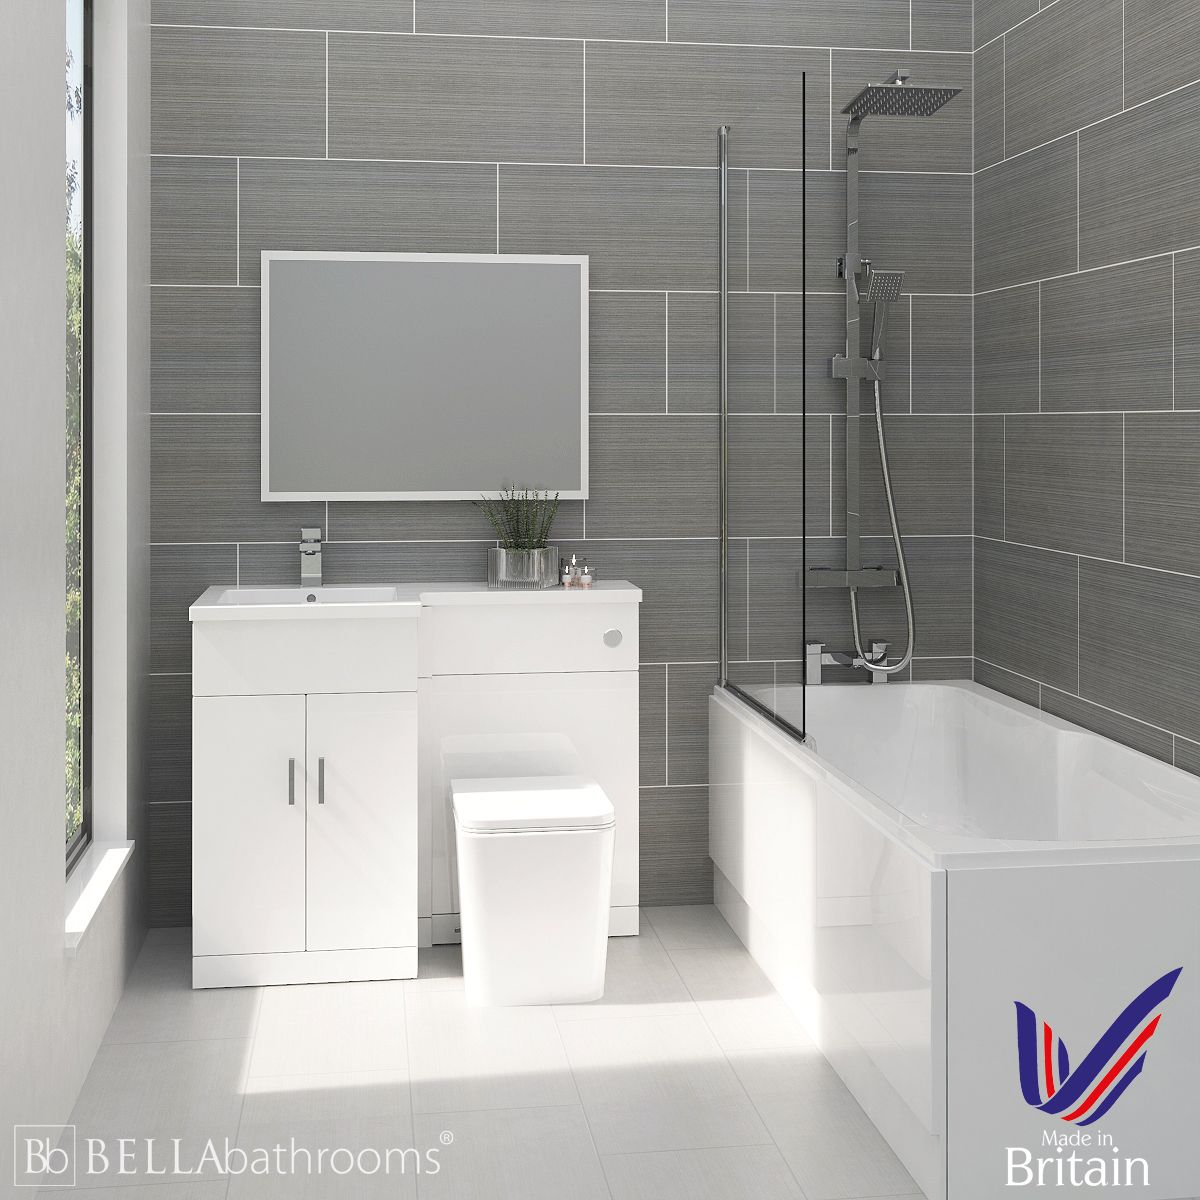 Elation Combination L Shape White Furniture Suite and Nuie Linton Shower Bath Left Hand